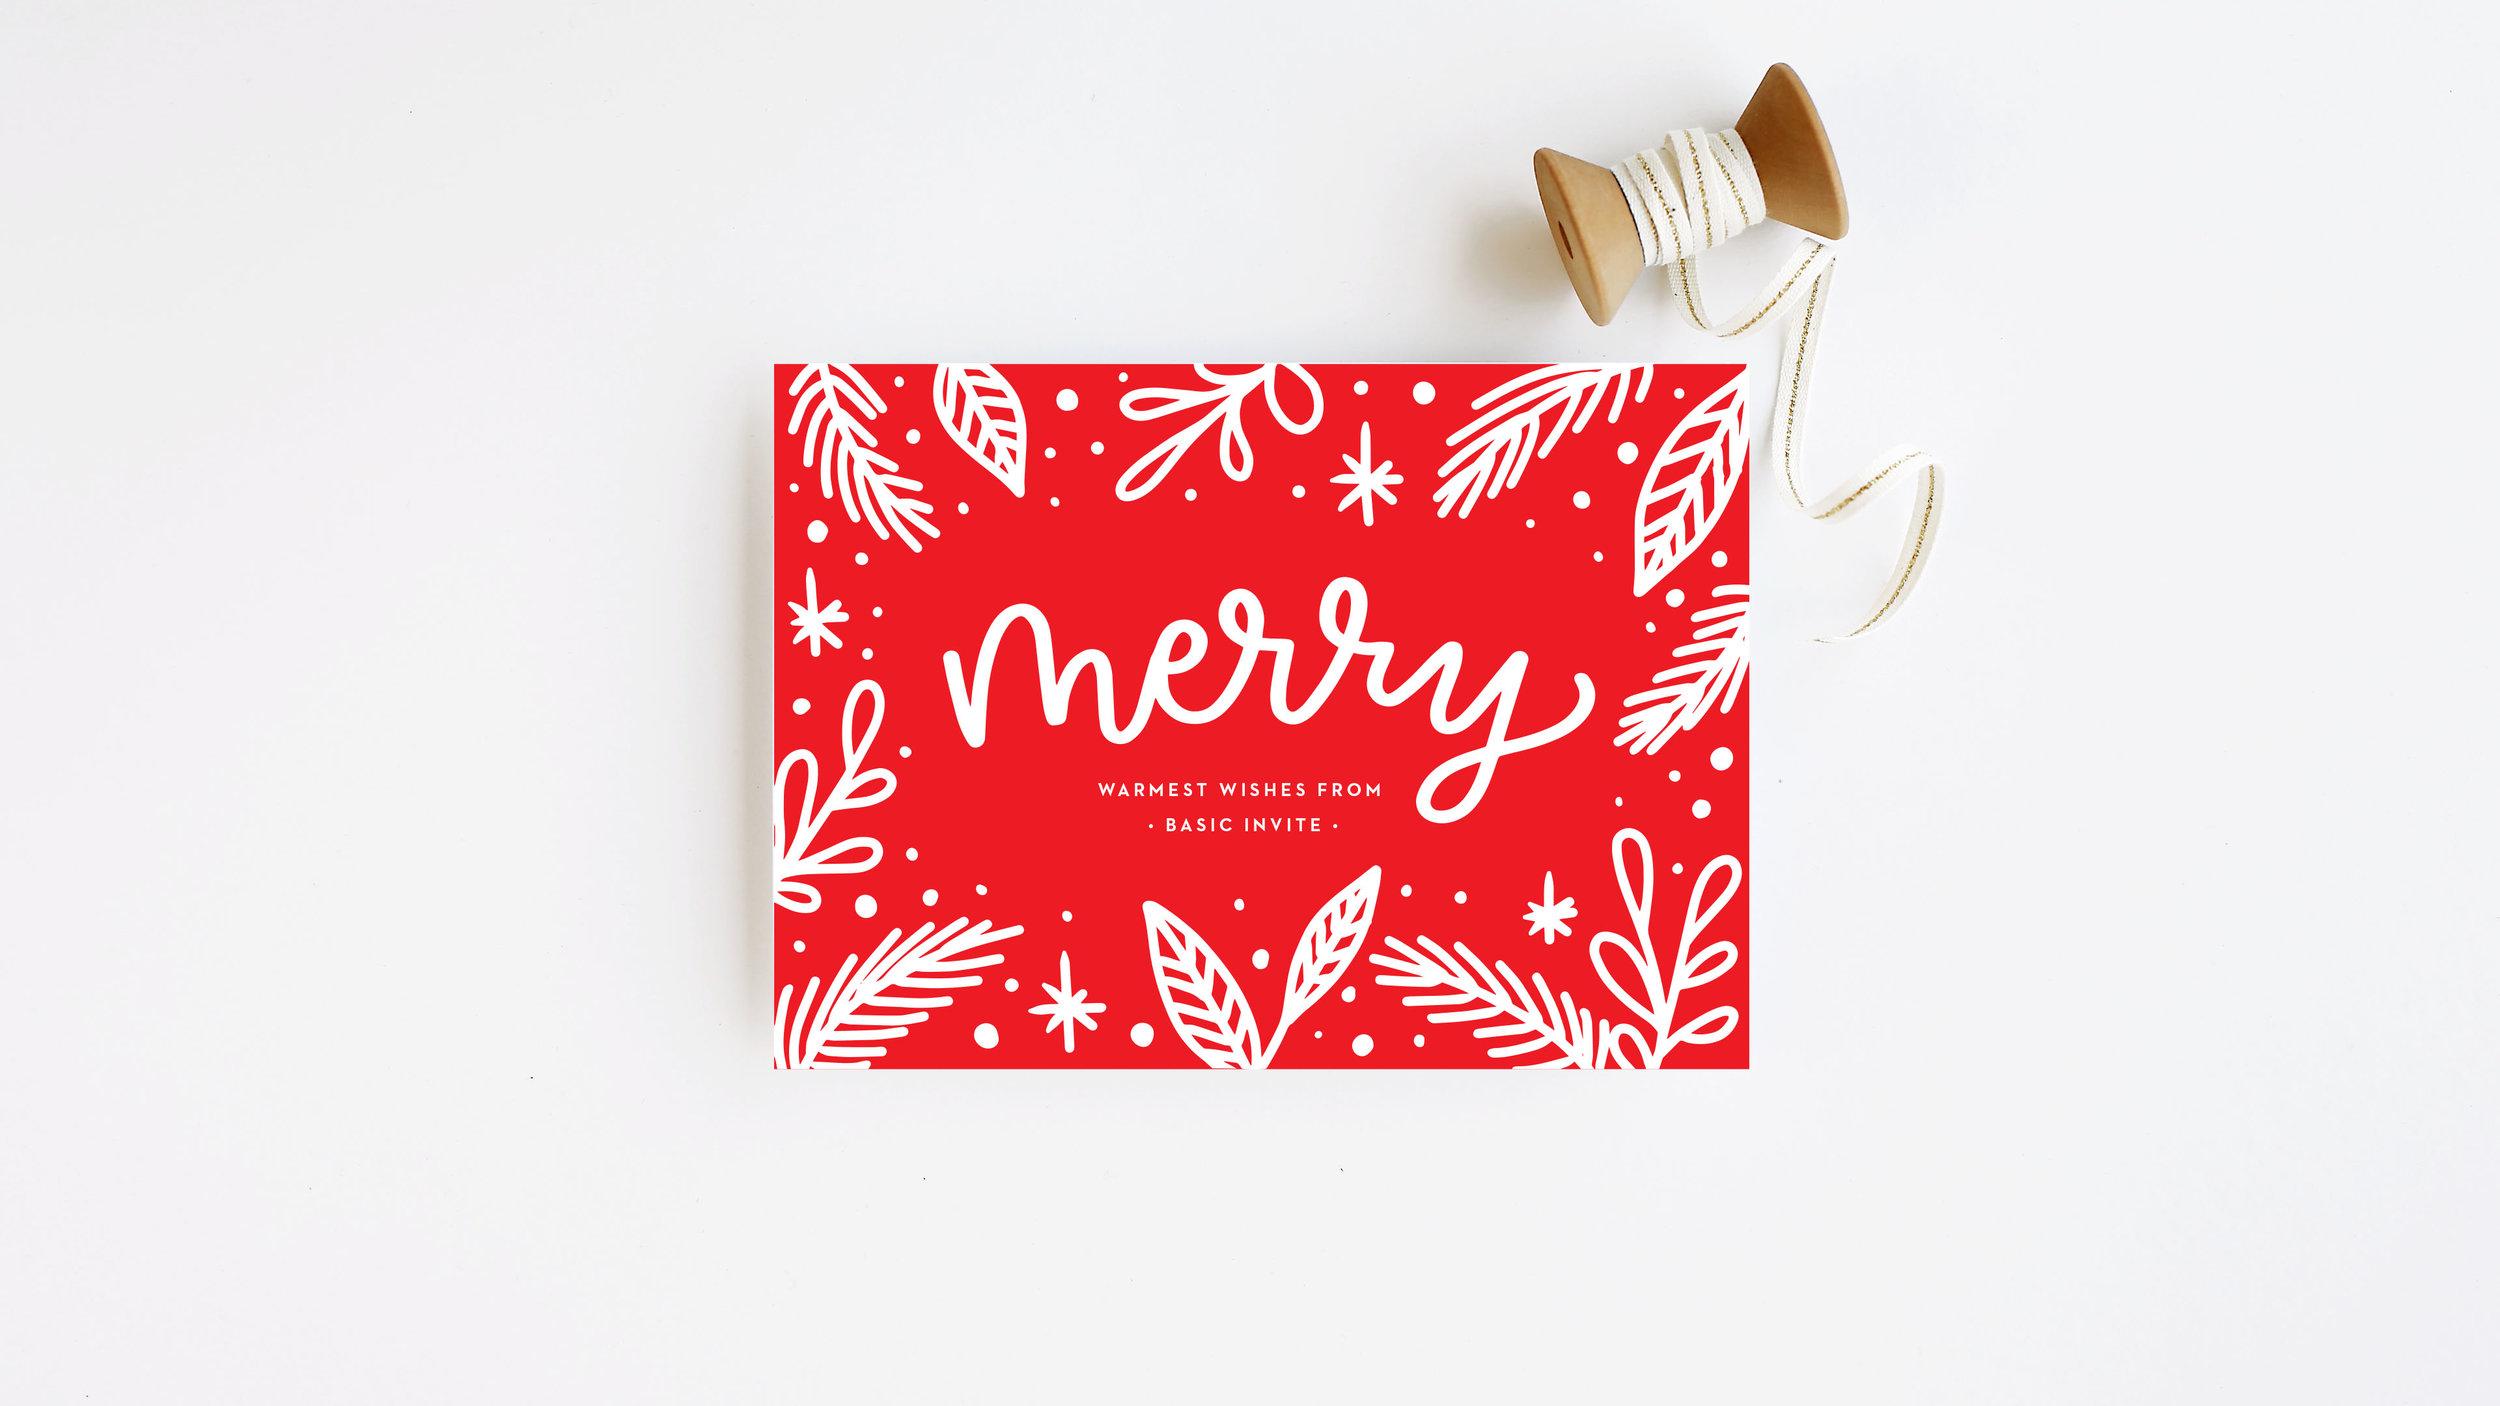 Basic_Invite_Holiday_Cards_31.jpg